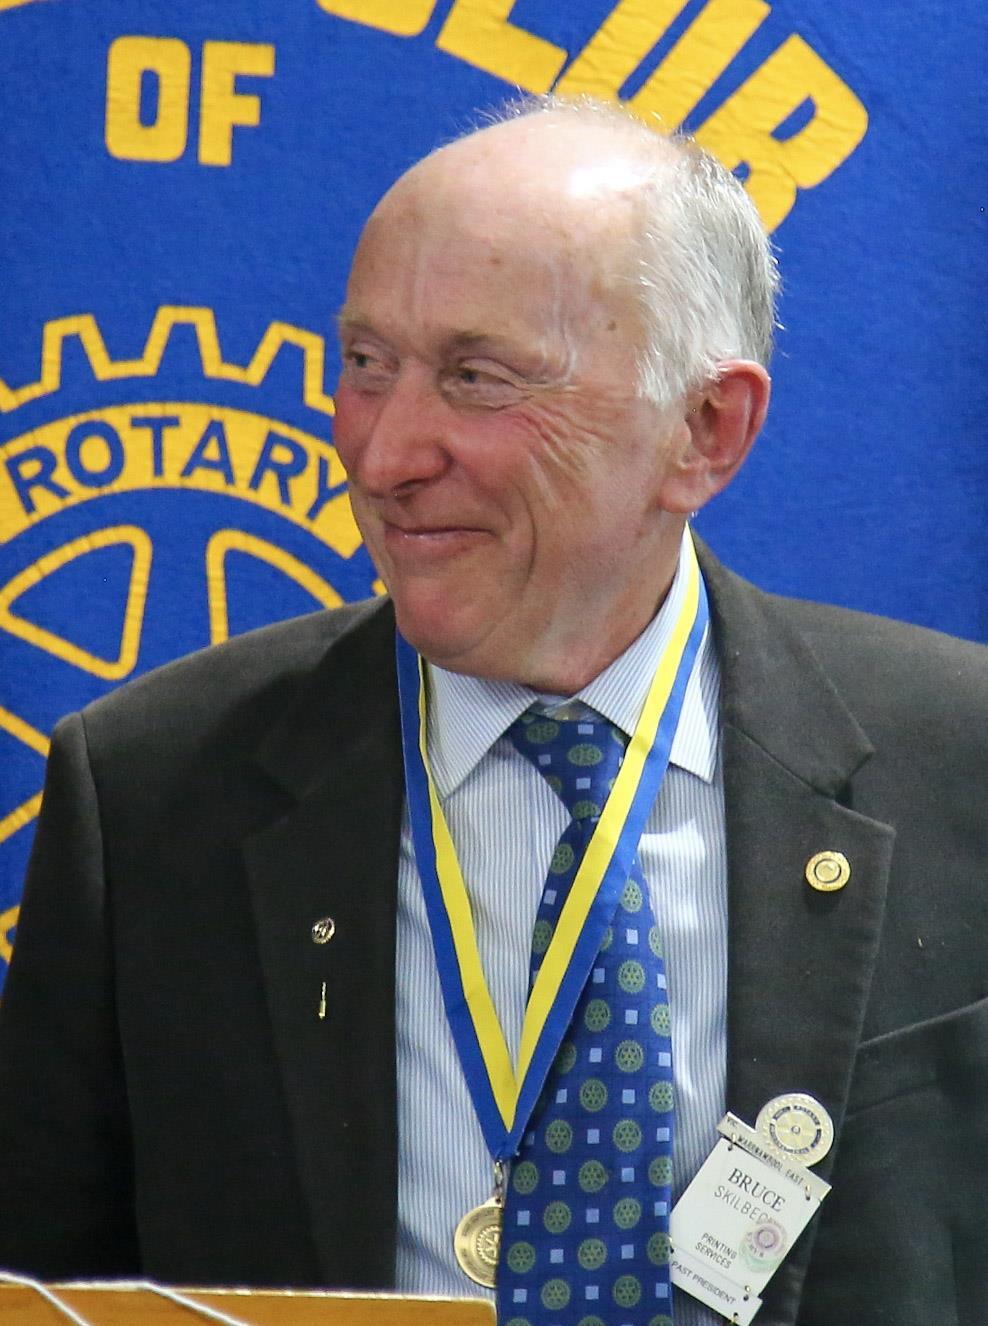 Bruce Skilbeck - Stewart Dumesny Award